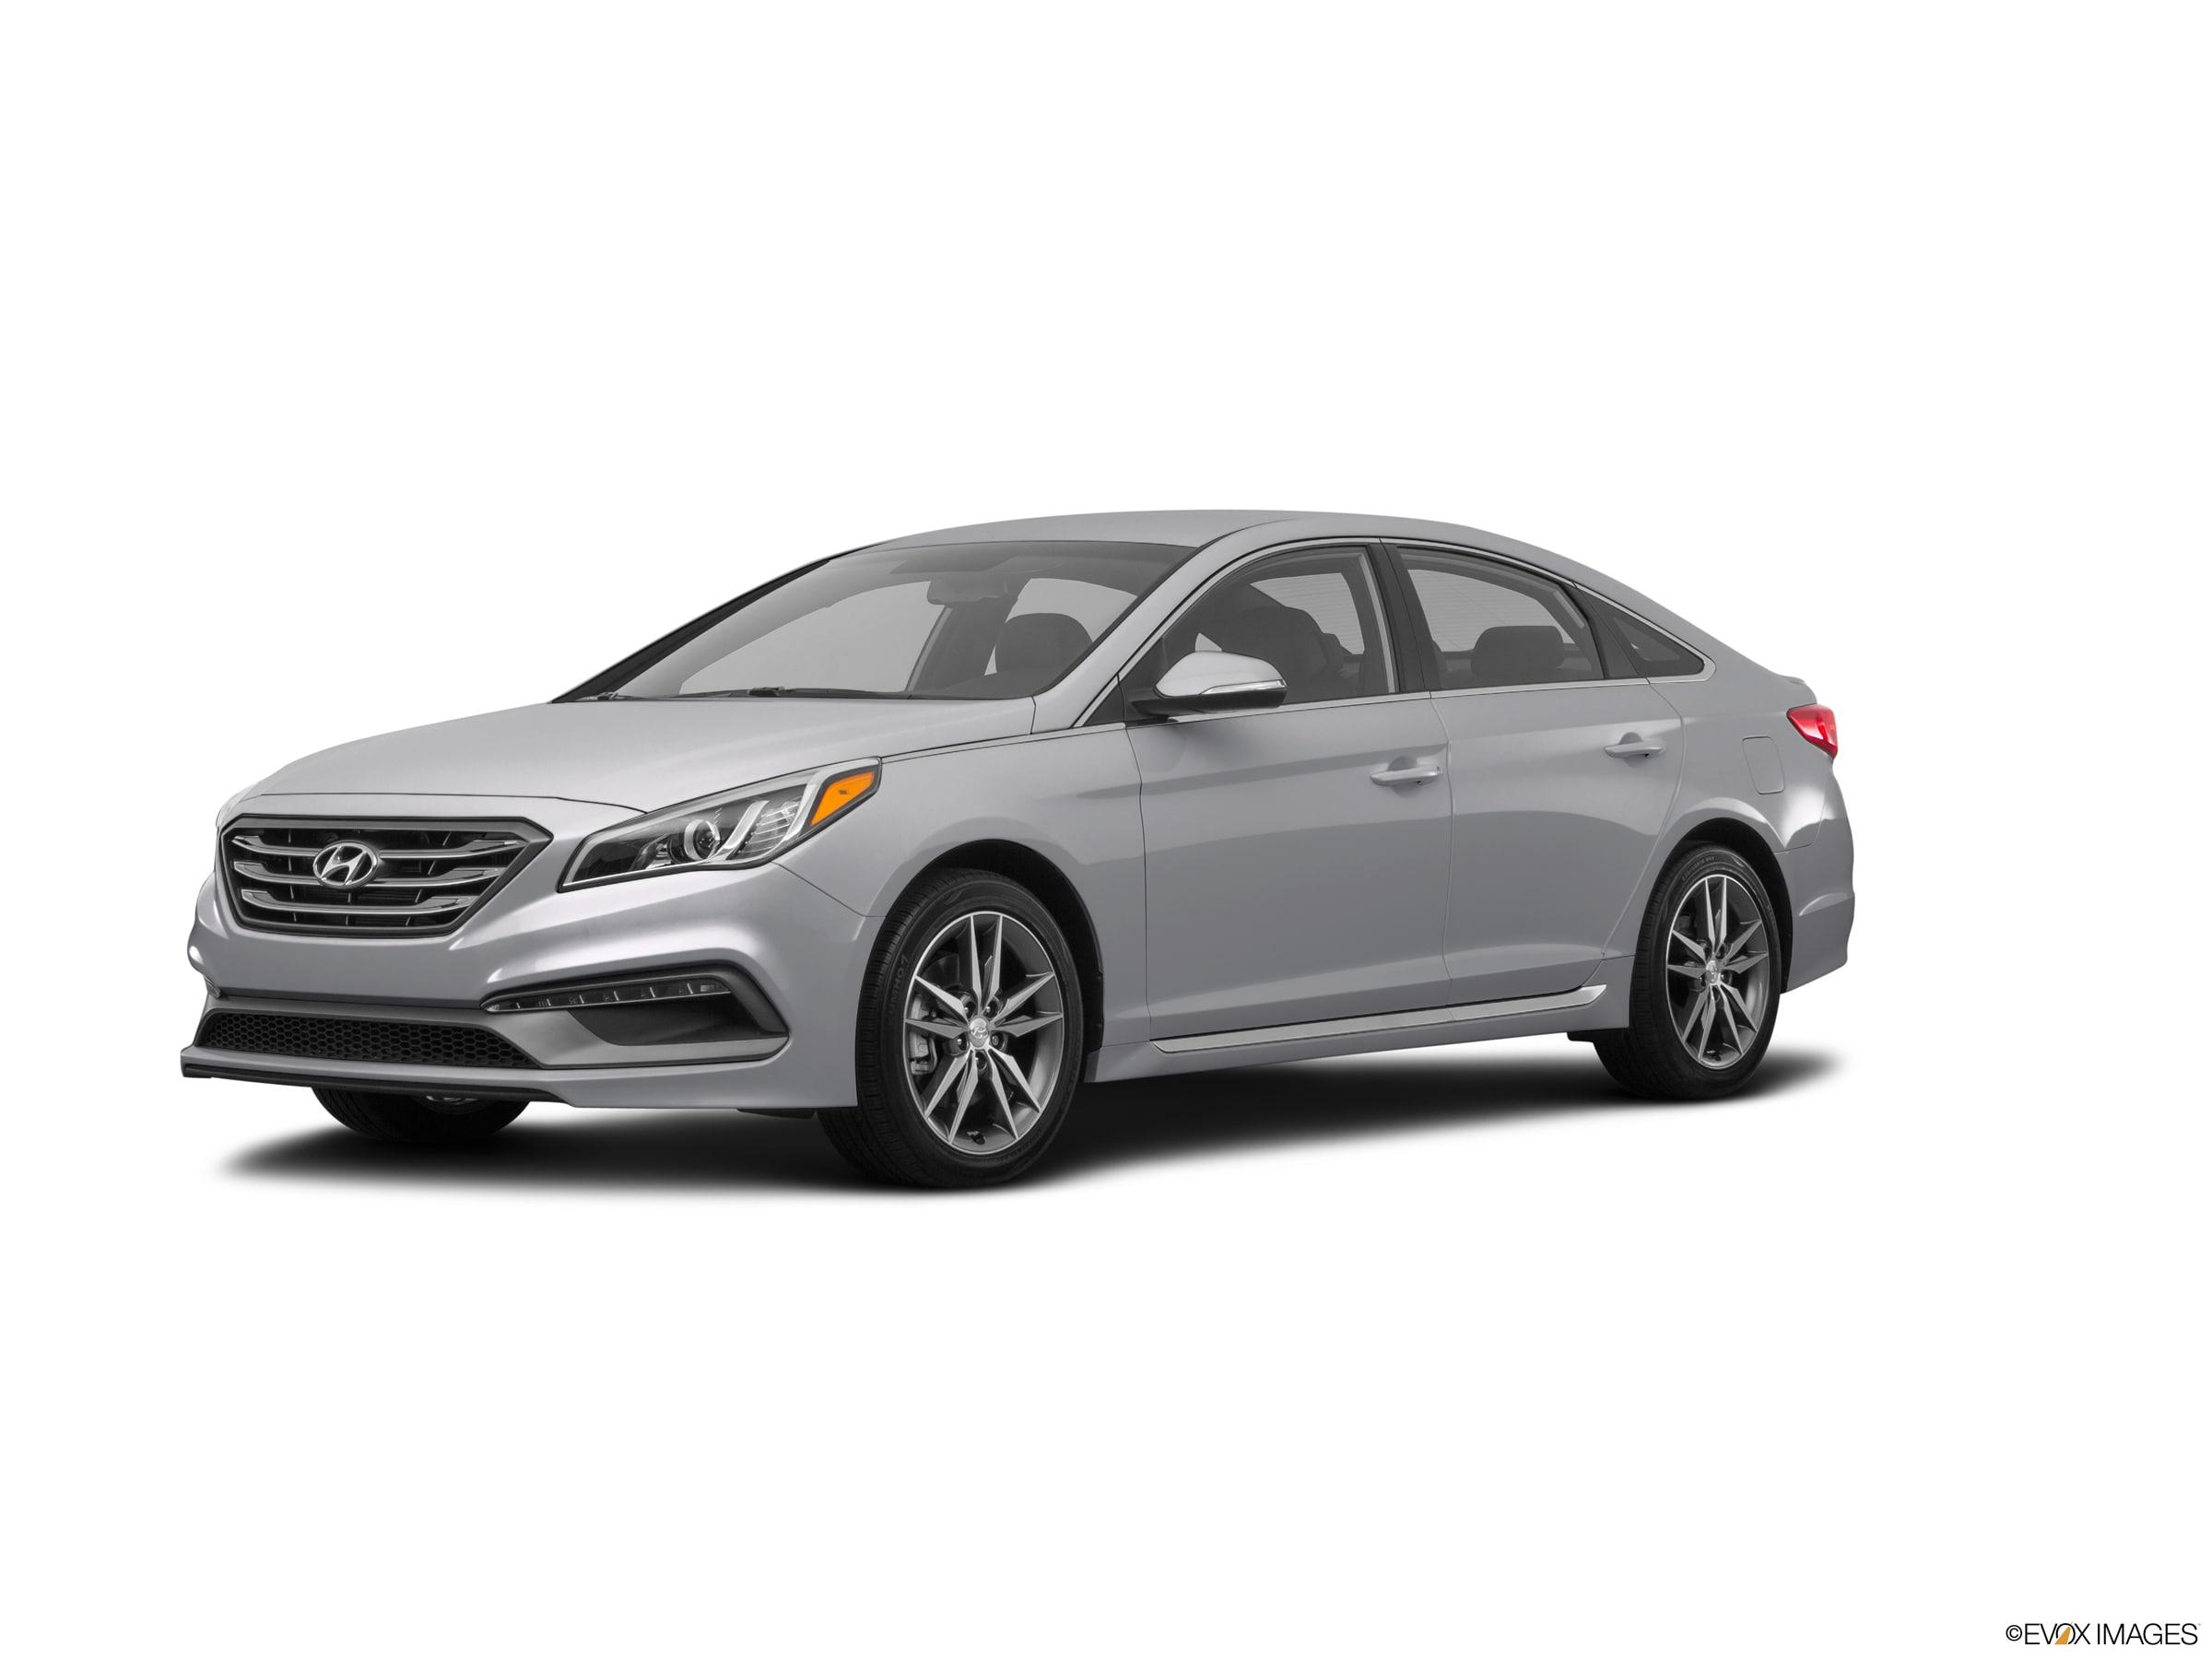 used 2017 Hyundai Sonata car, priced at $13,488